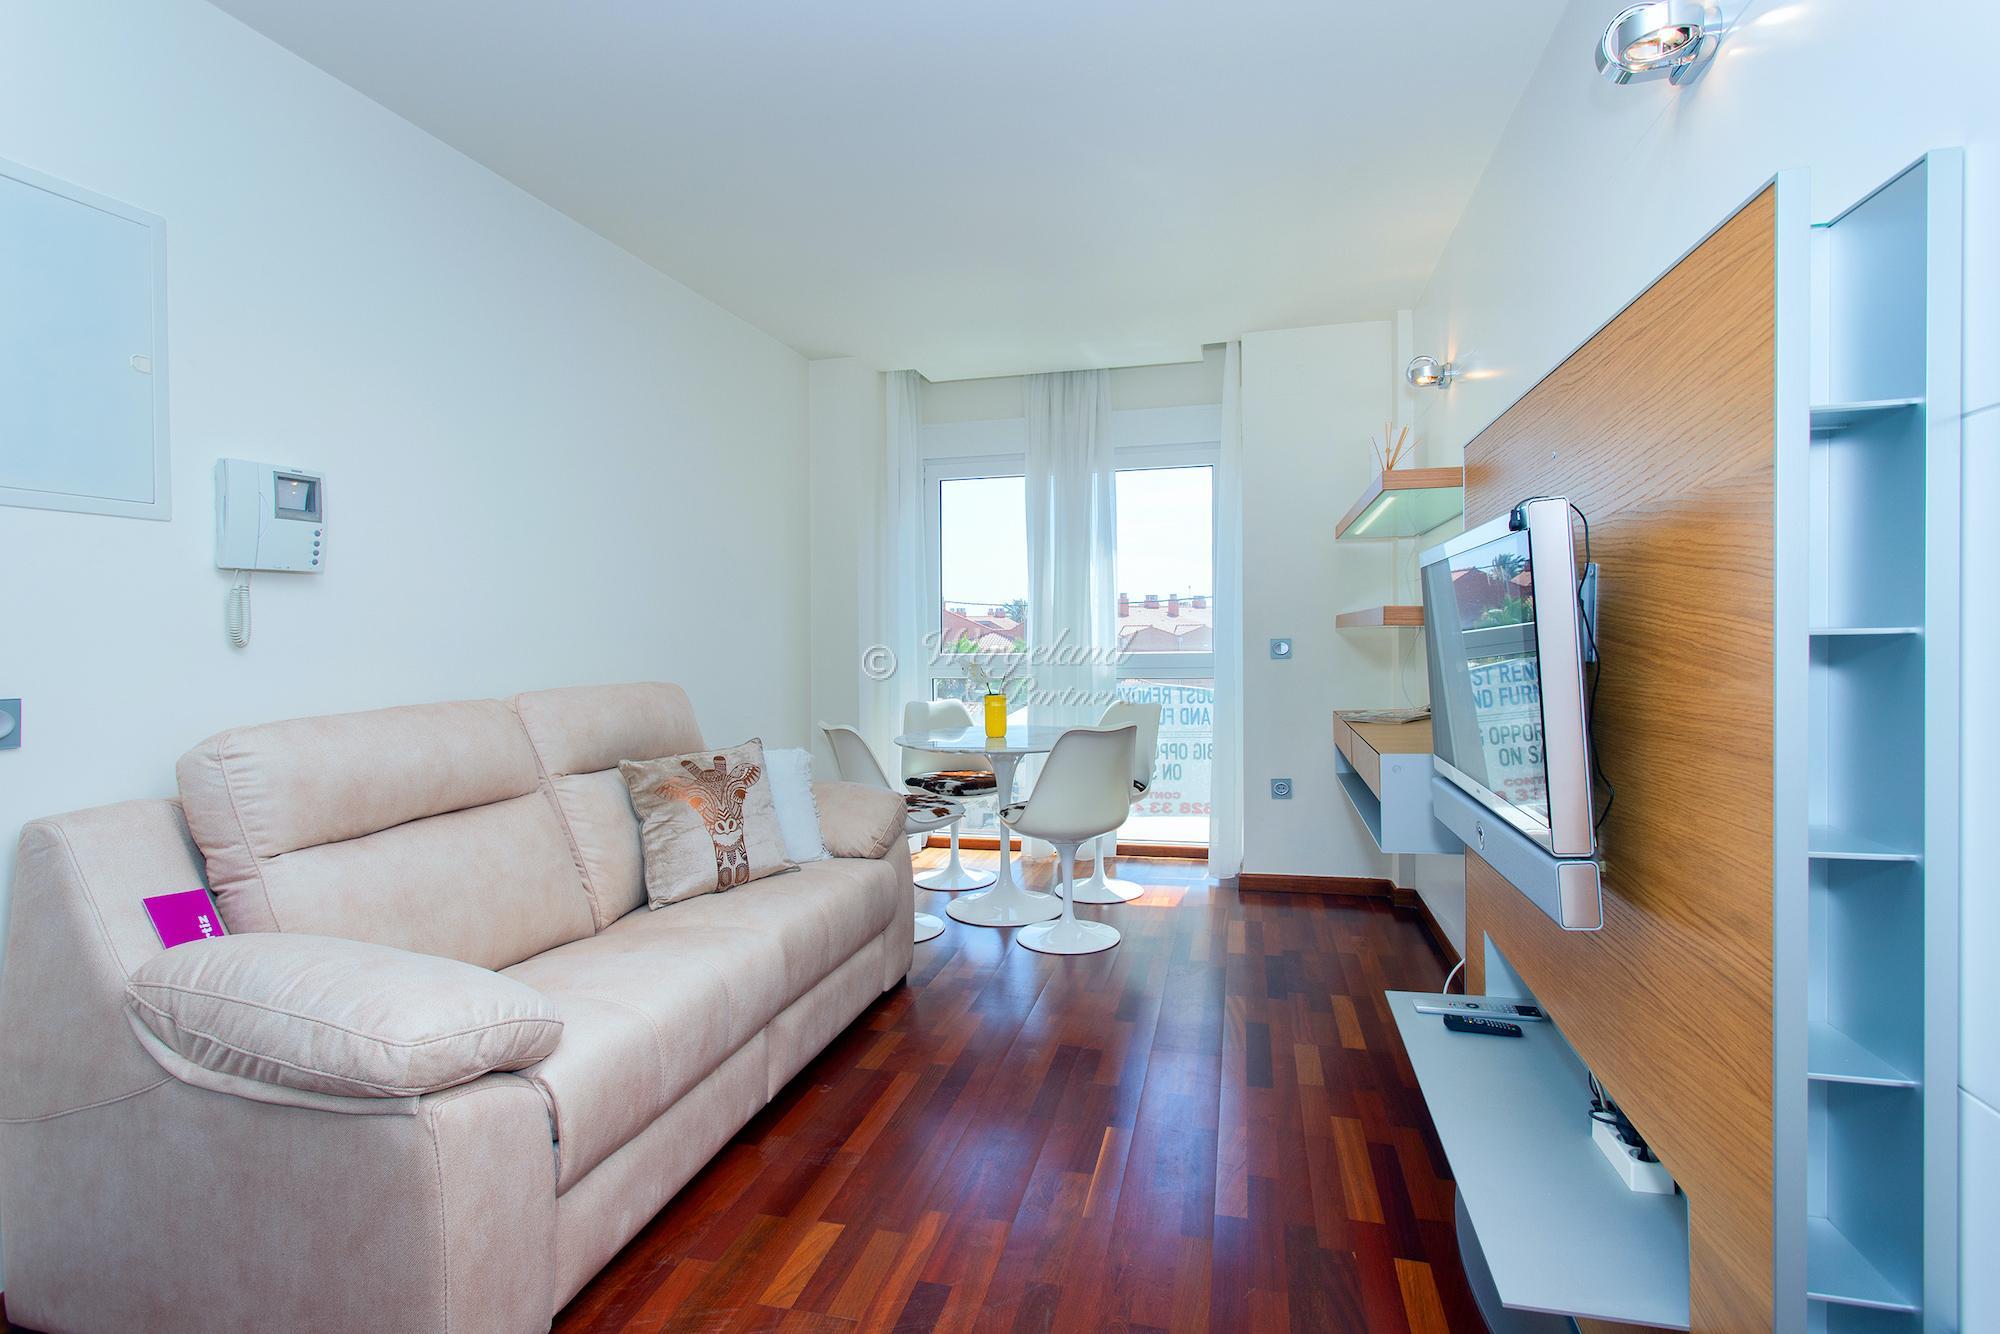 3-roms nyoppusset og møblert leilighet ved torget [PMD]